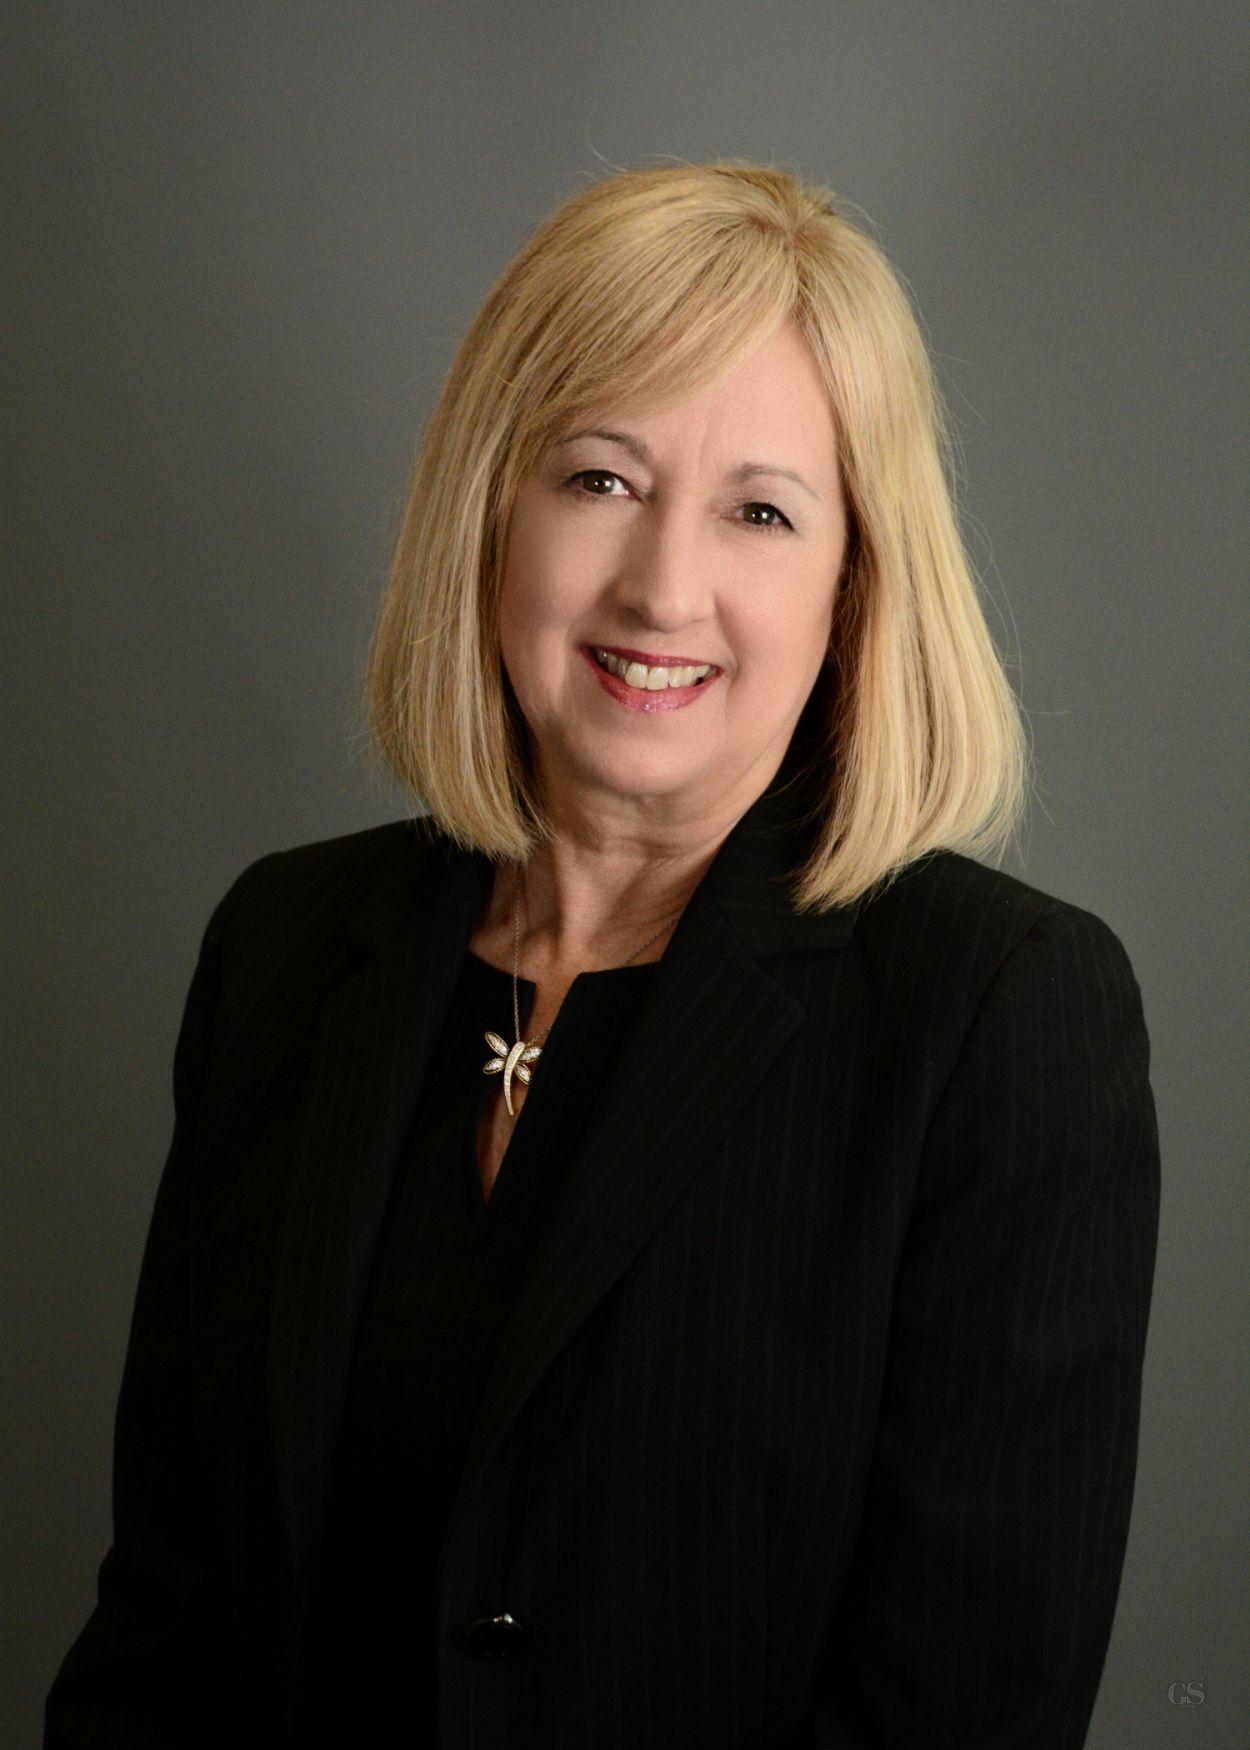 Cynthia E Rolfe, Ph.D